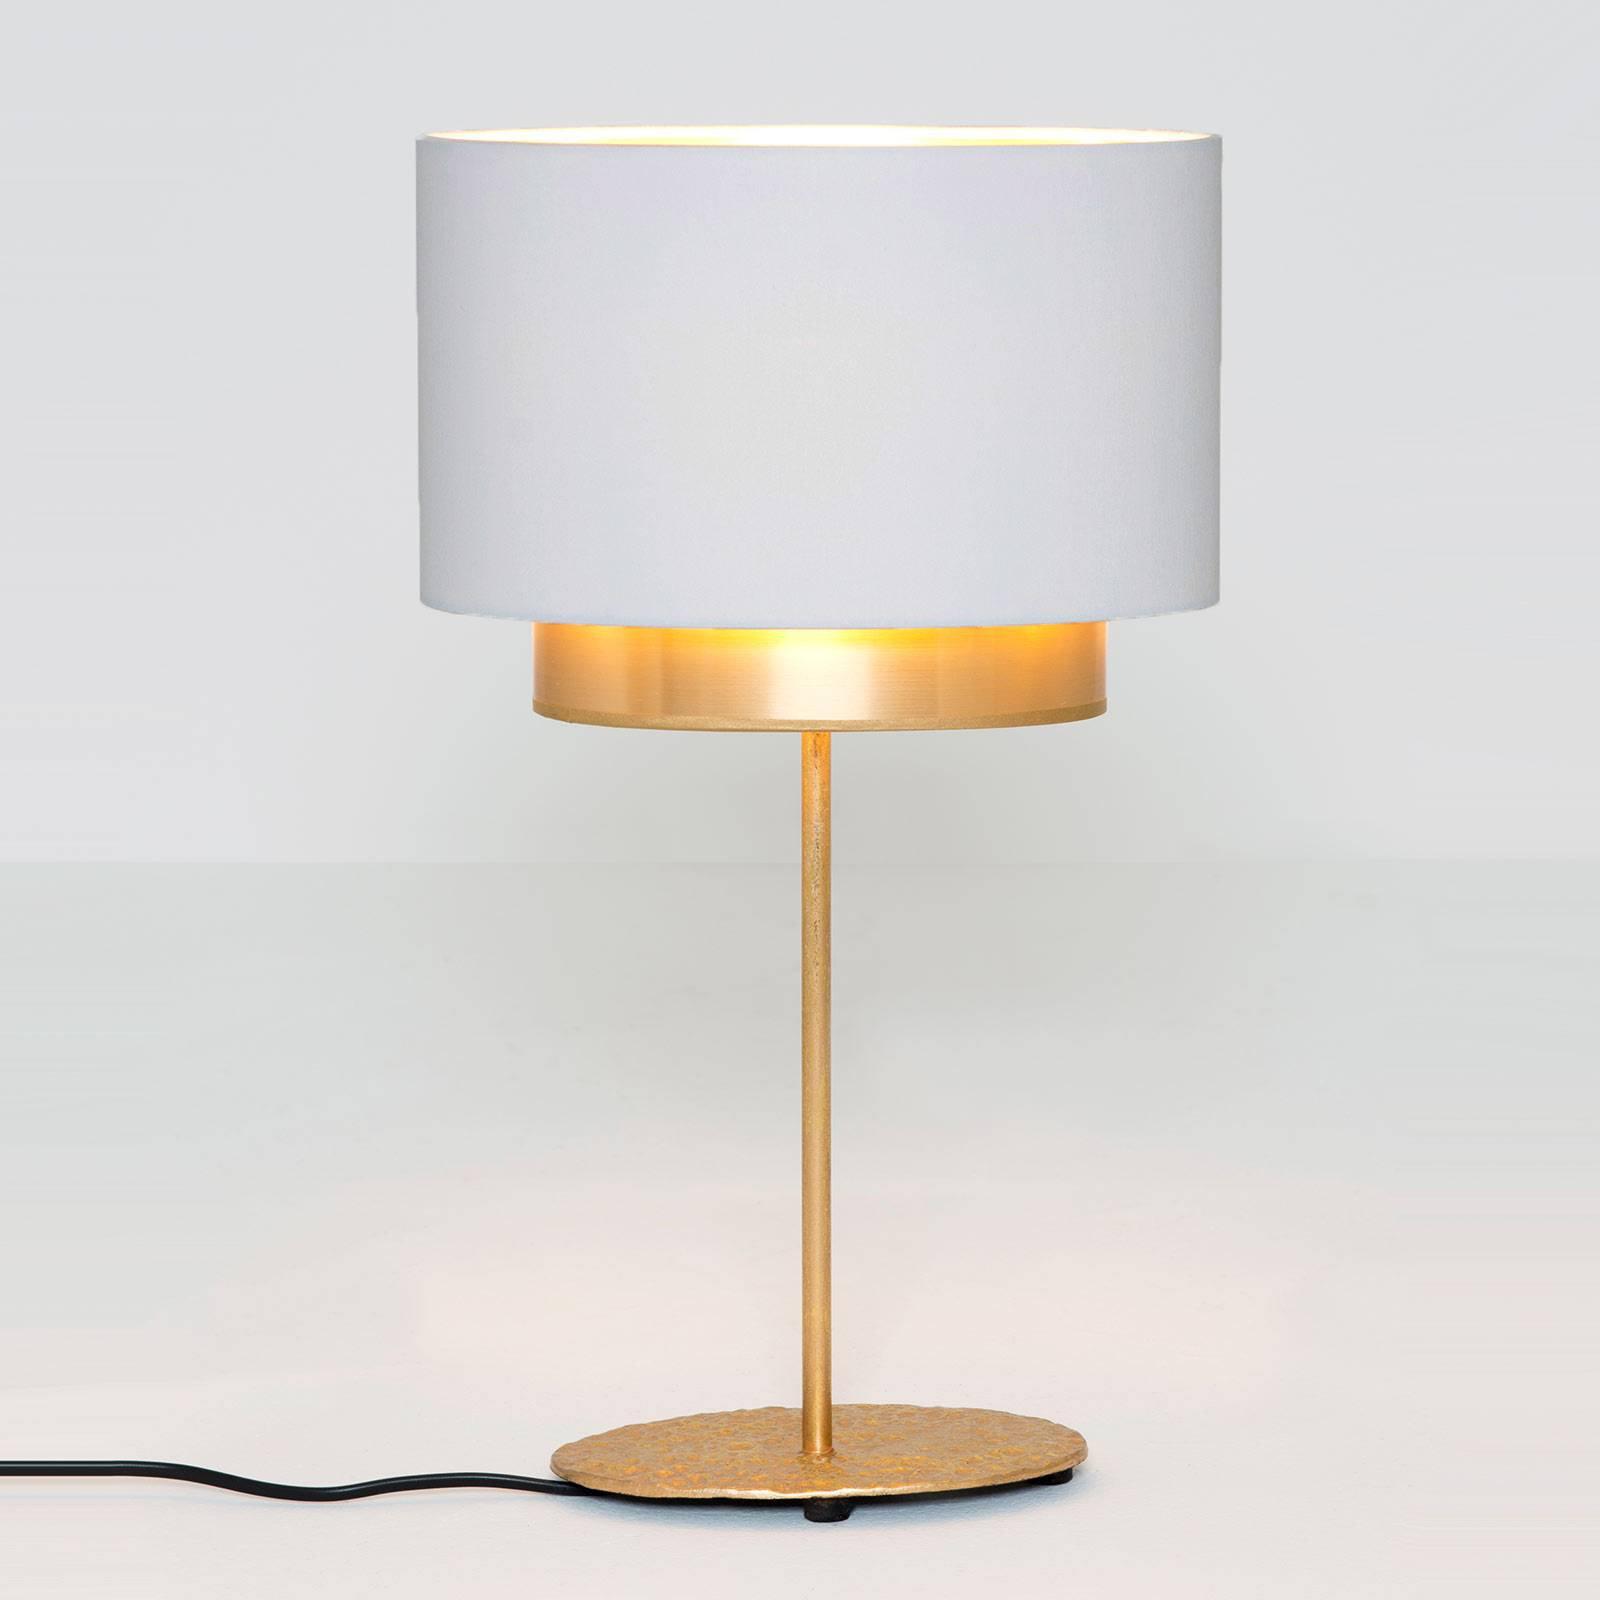 Bordlampe Mattia, oval, dobbel, hvit/gull